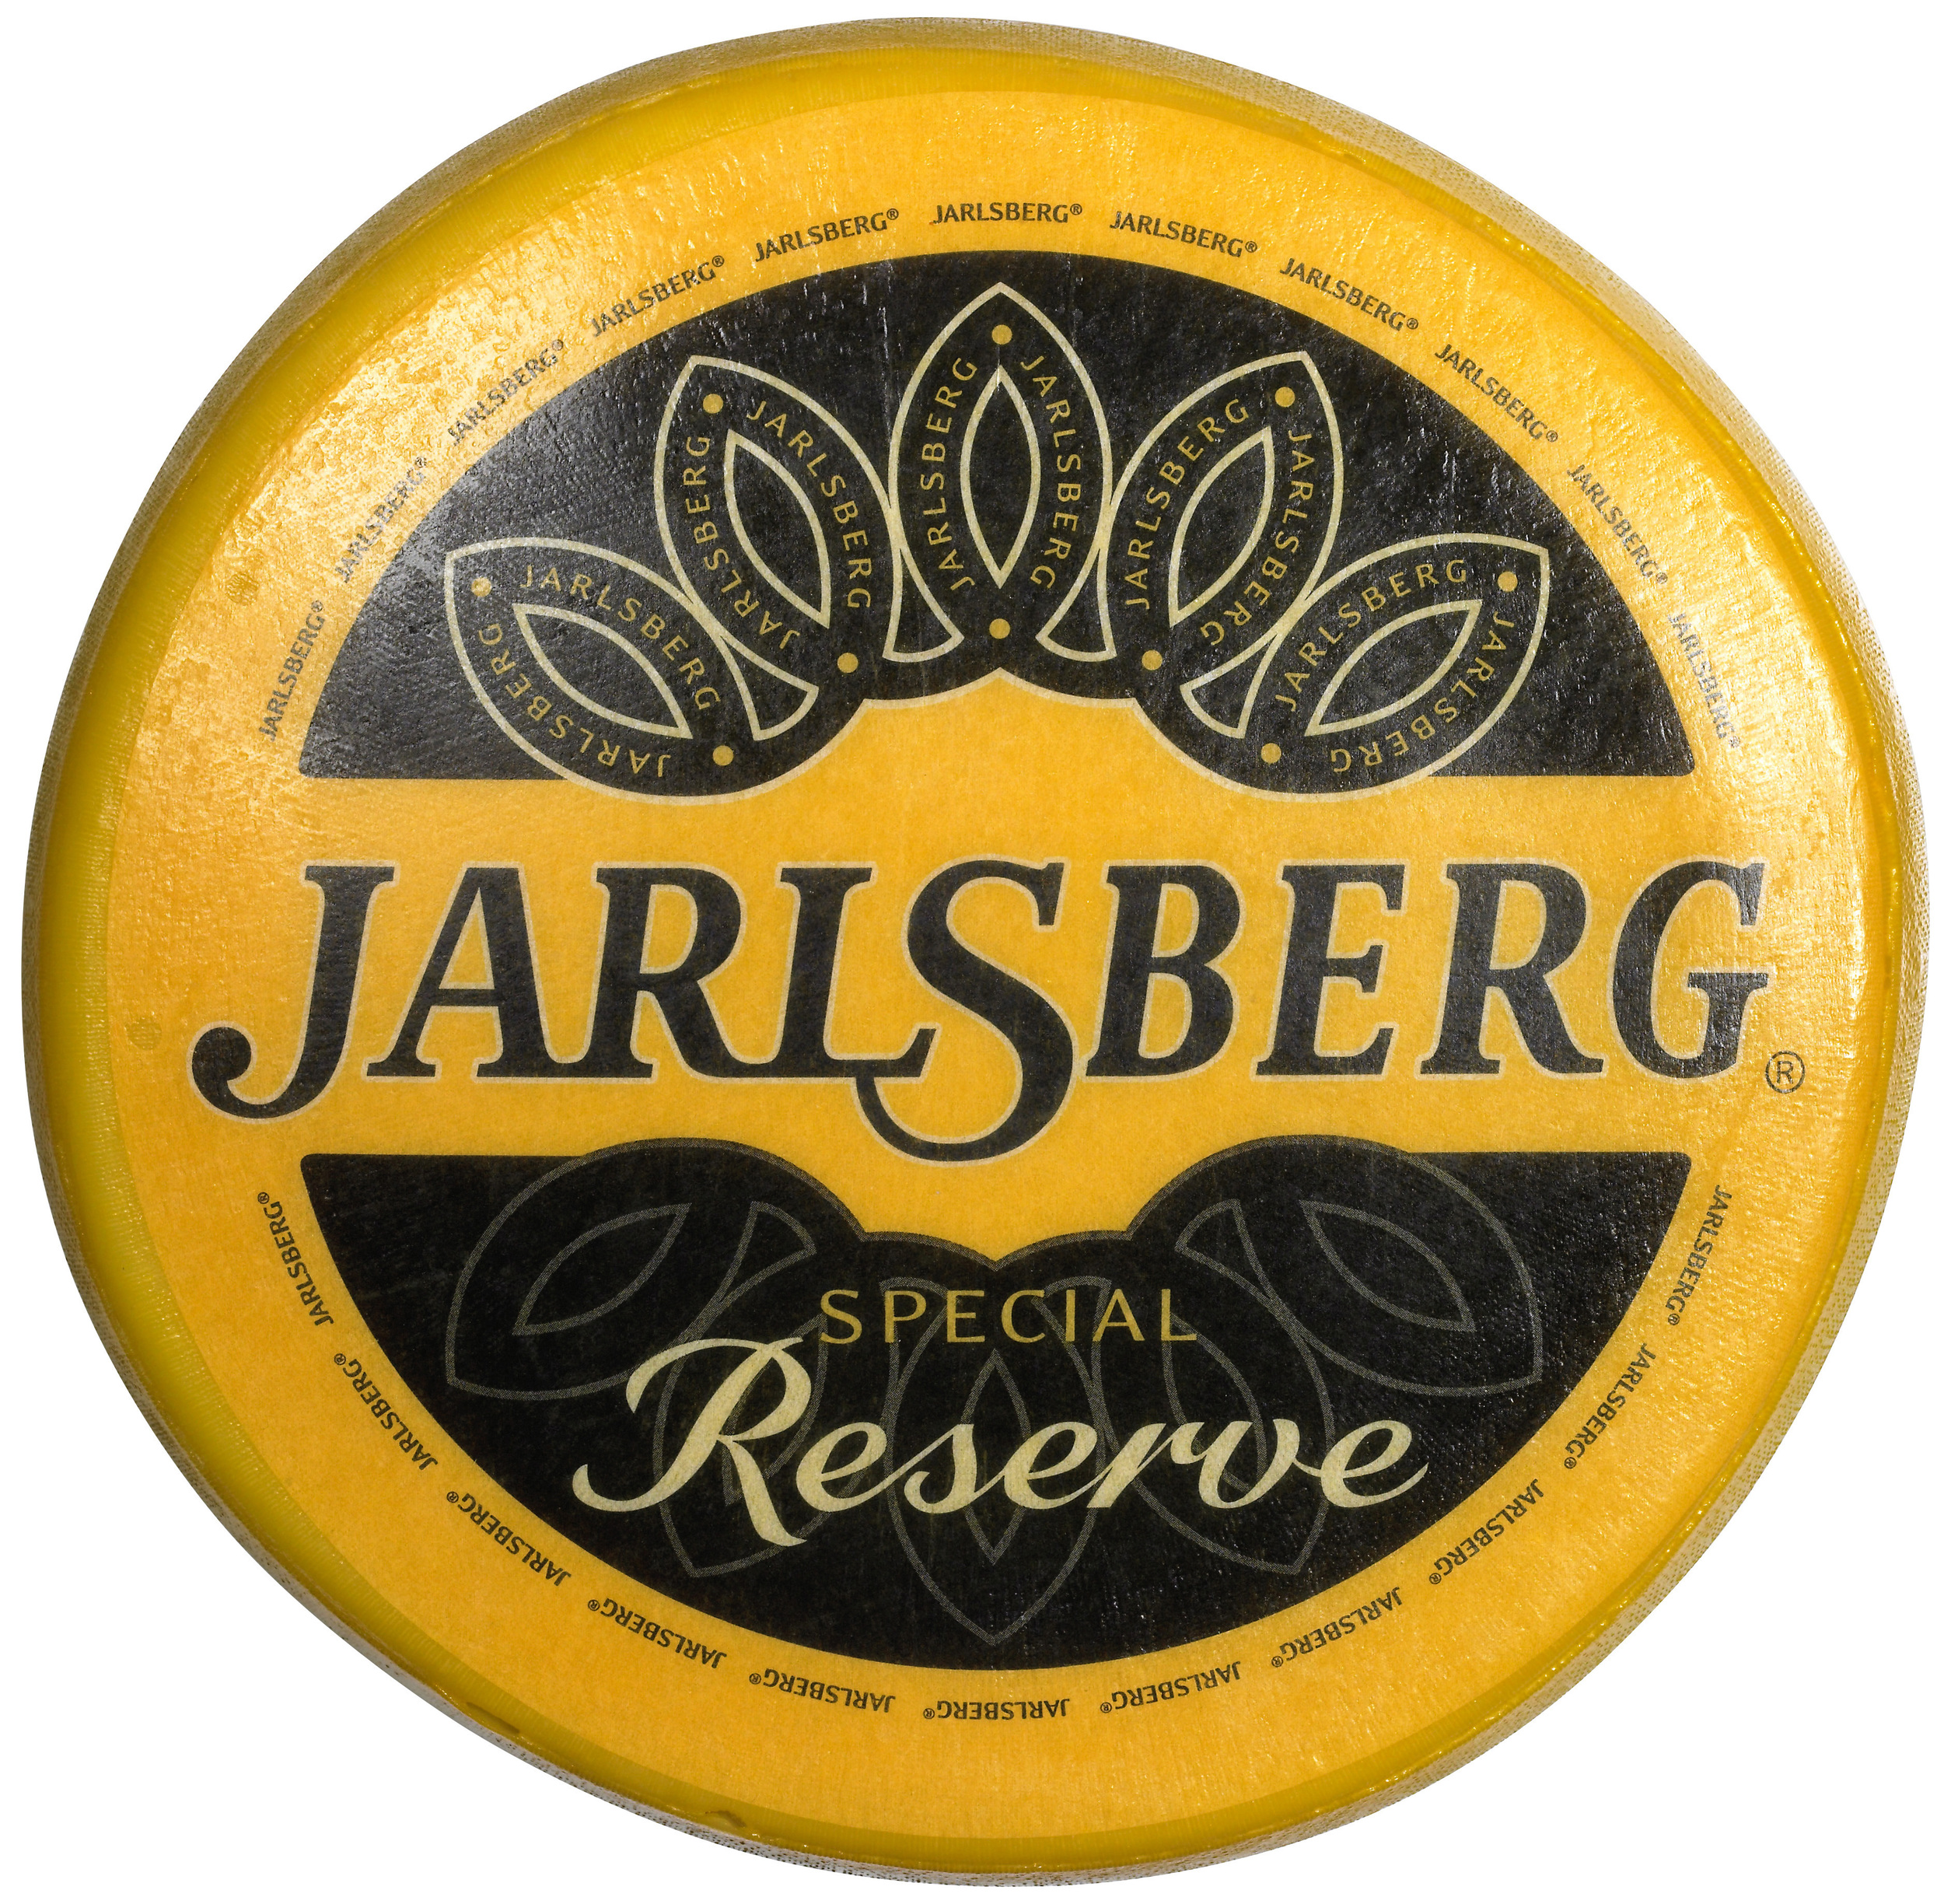 Jarlsberg Reserve.jpg